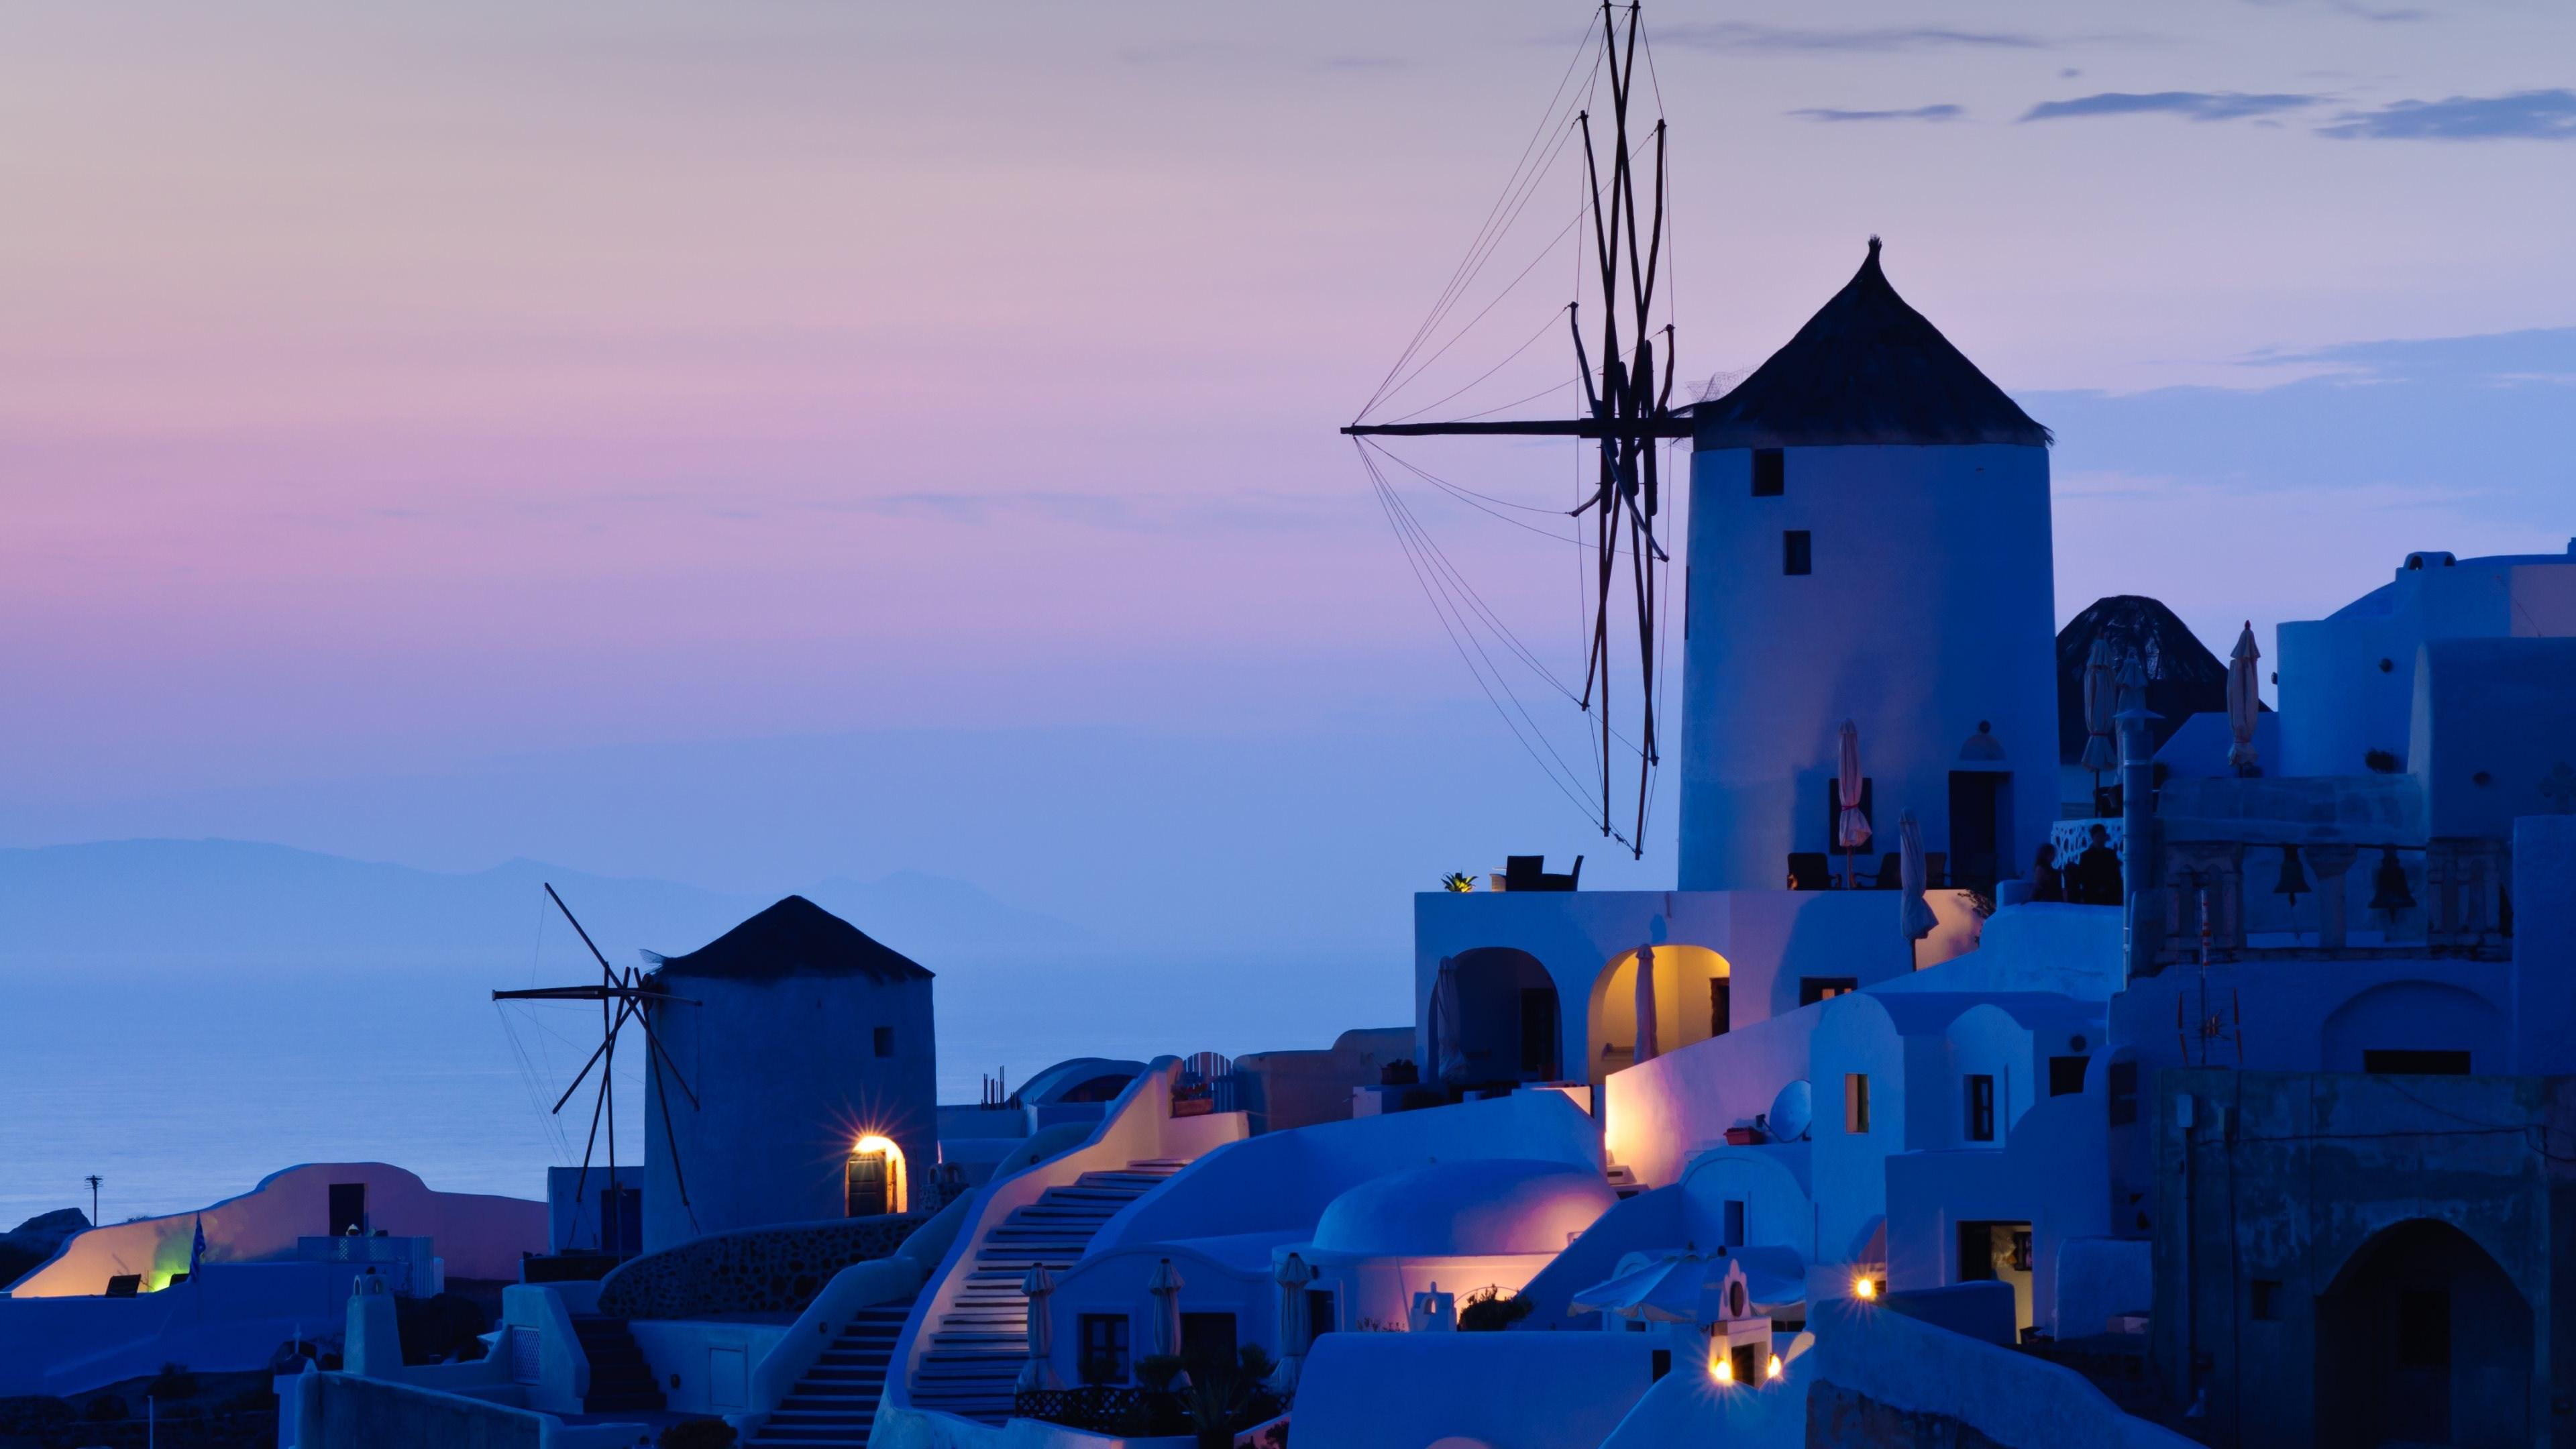 Santorini wallpapers pictures images - Wallpaper hd 4k ...